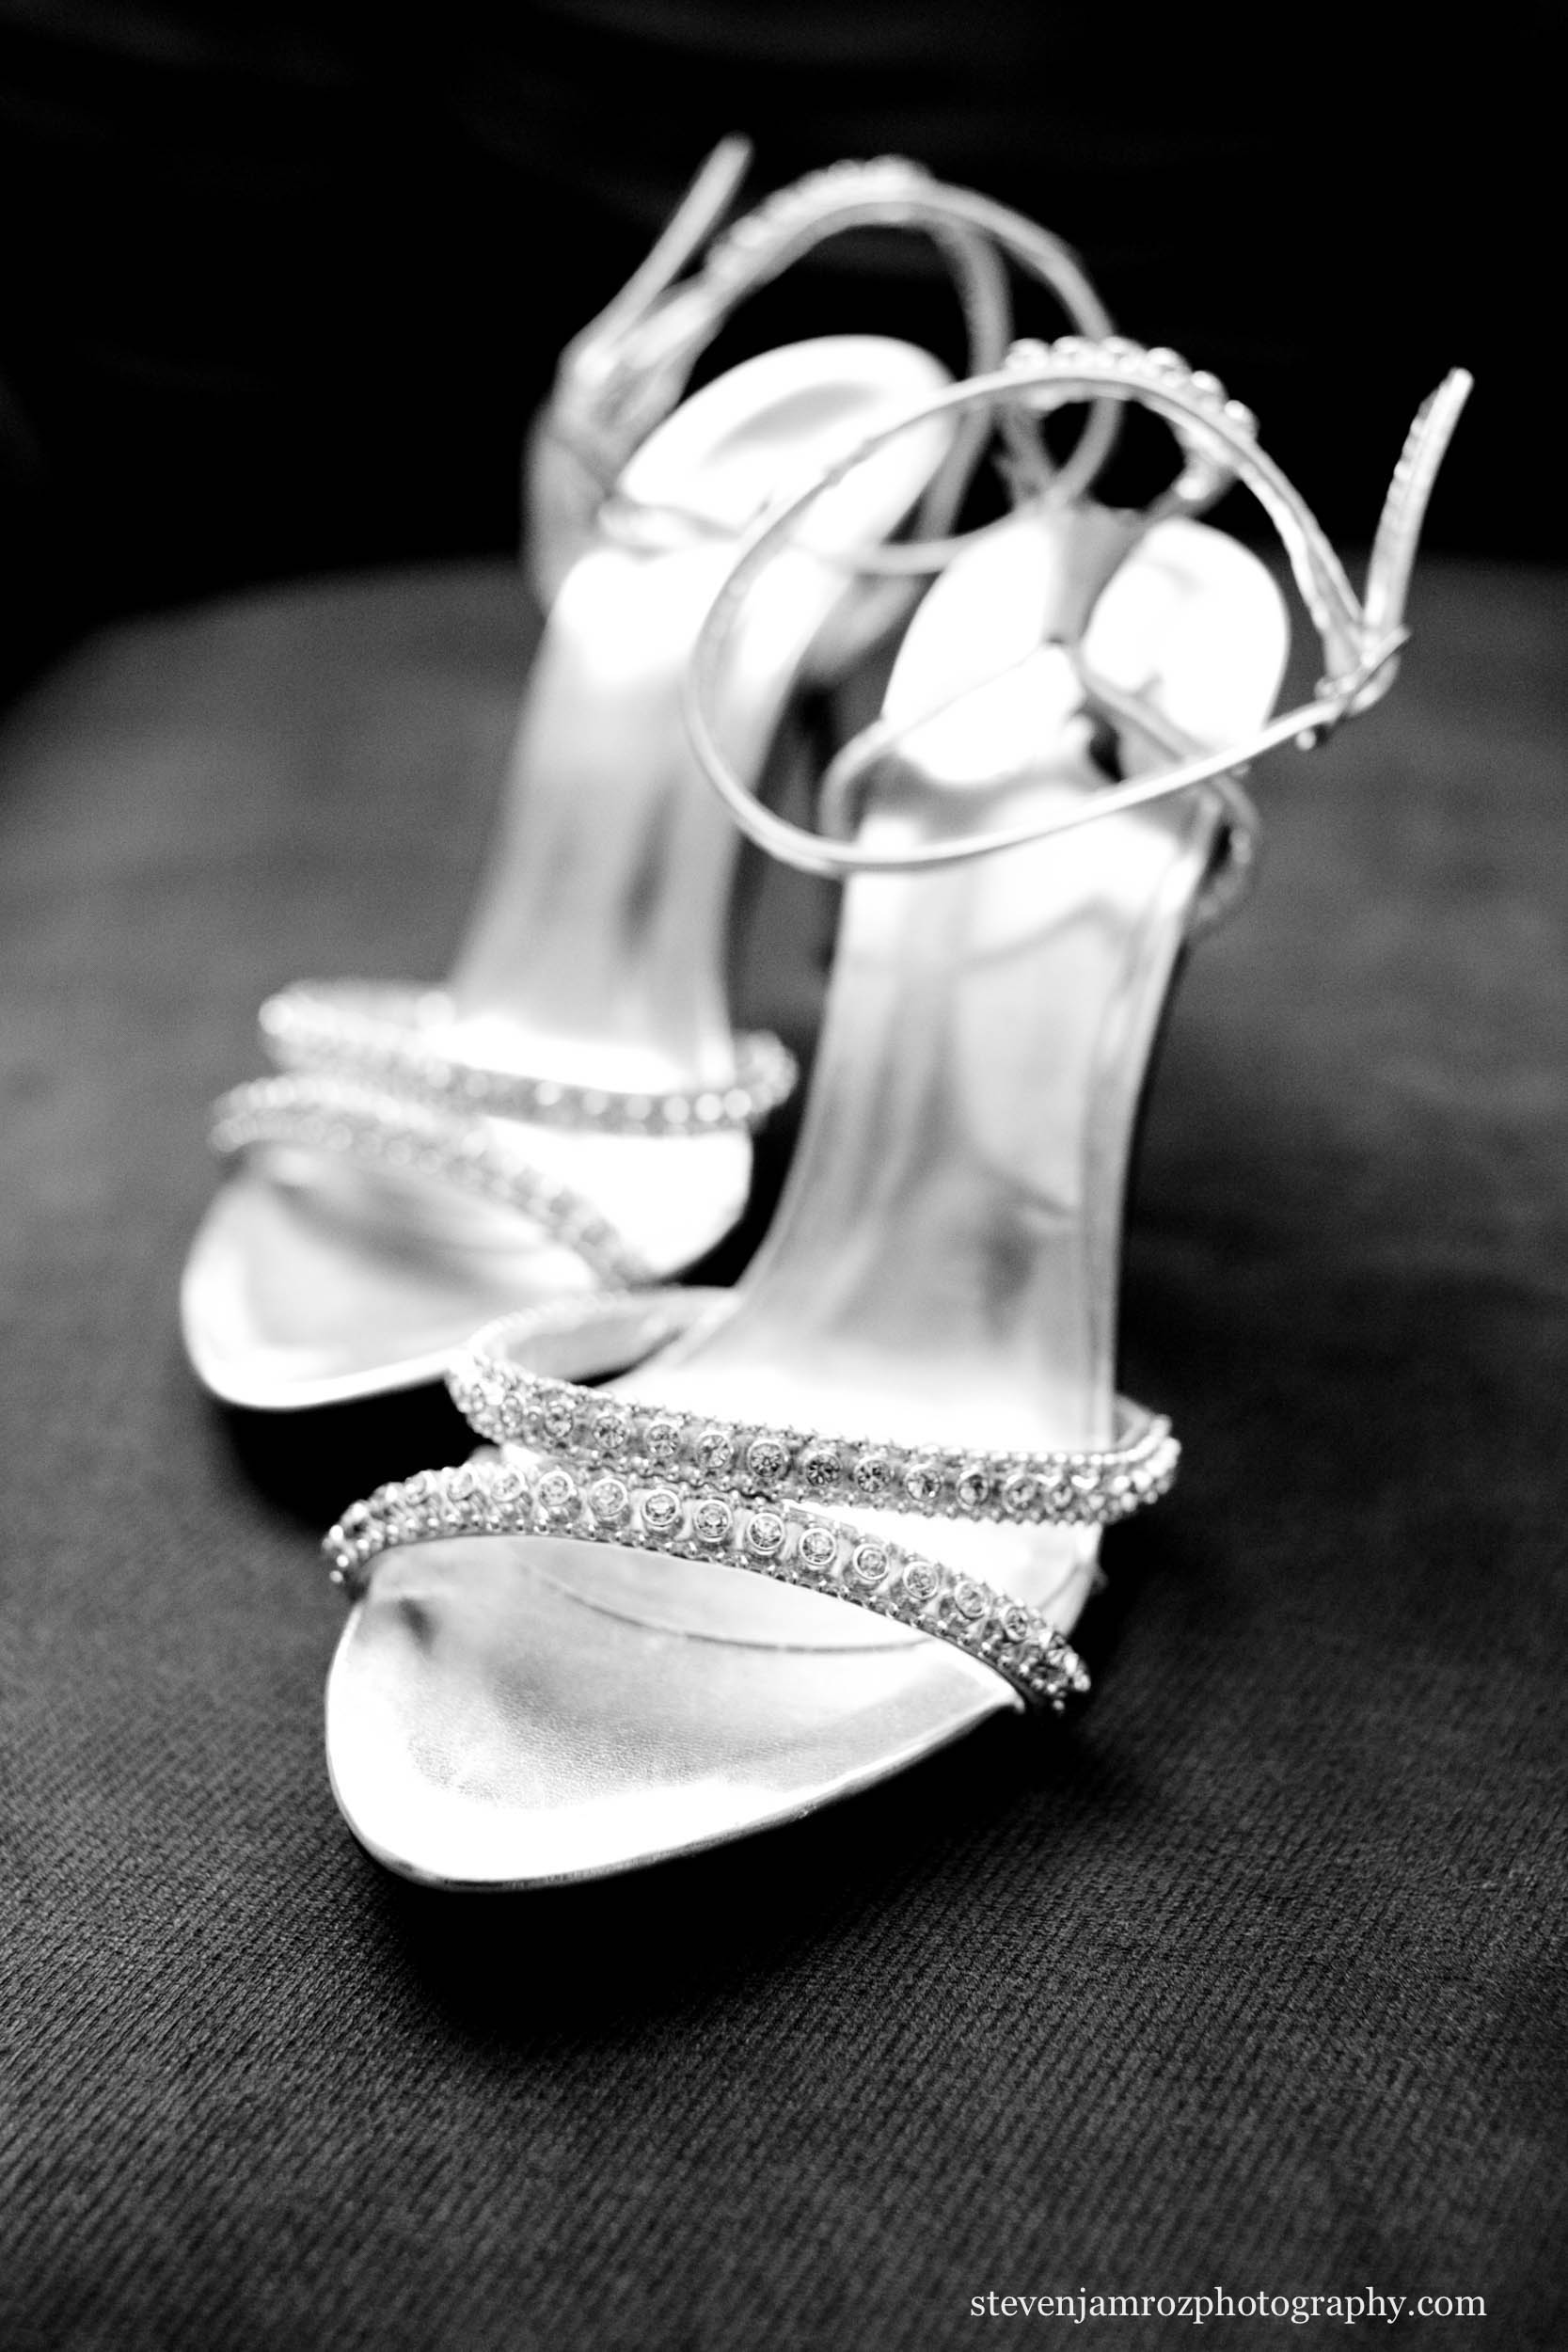 pretty-wedding-shoes-raleigh-steven-jamroz-photography-0227.jpg